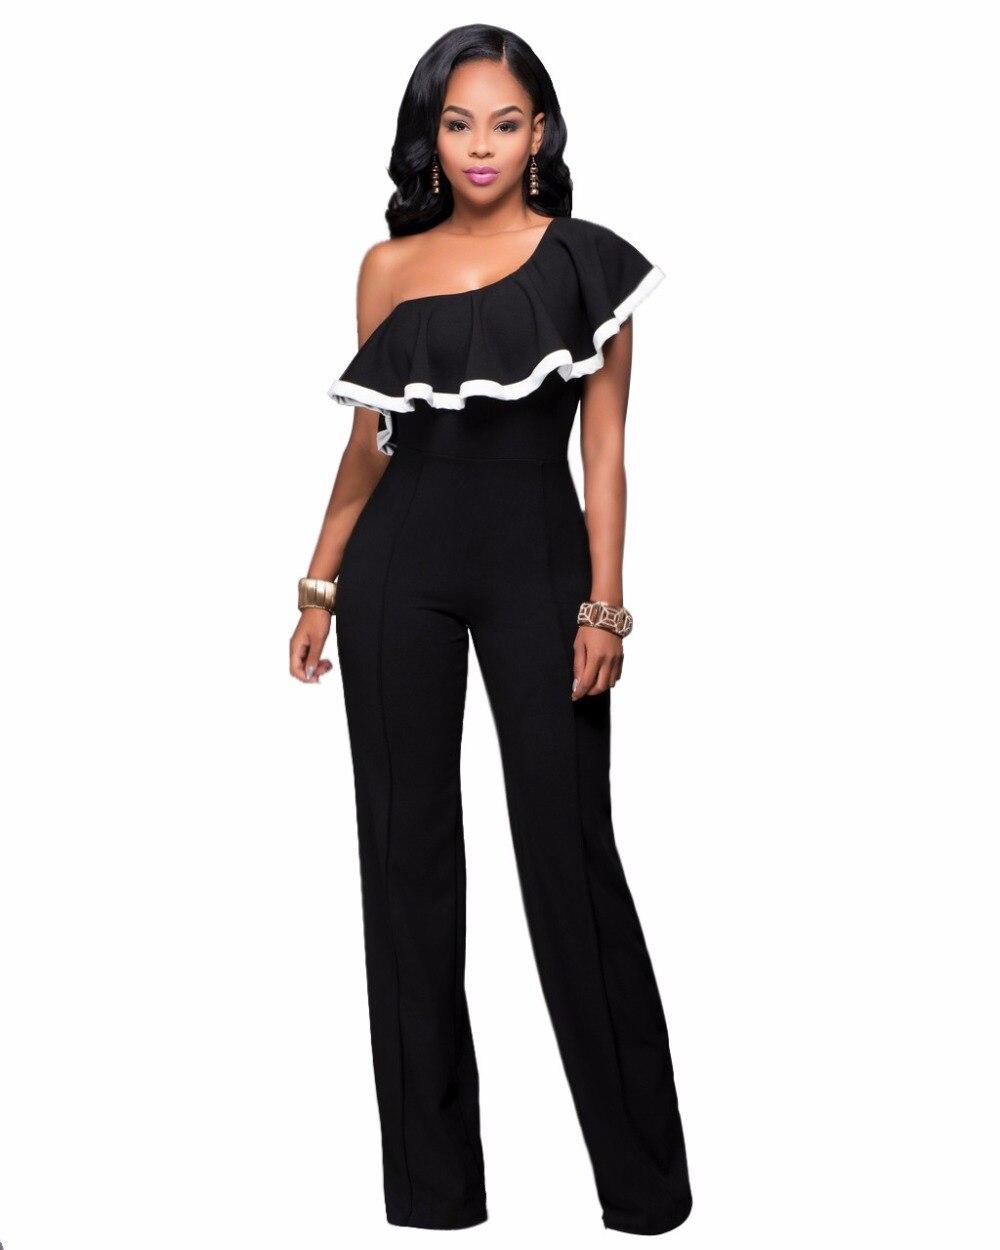 londinas ark store elegant long rompers jumpsuits womens. Black Bedroom Furniture Sets. Home Design Ideas